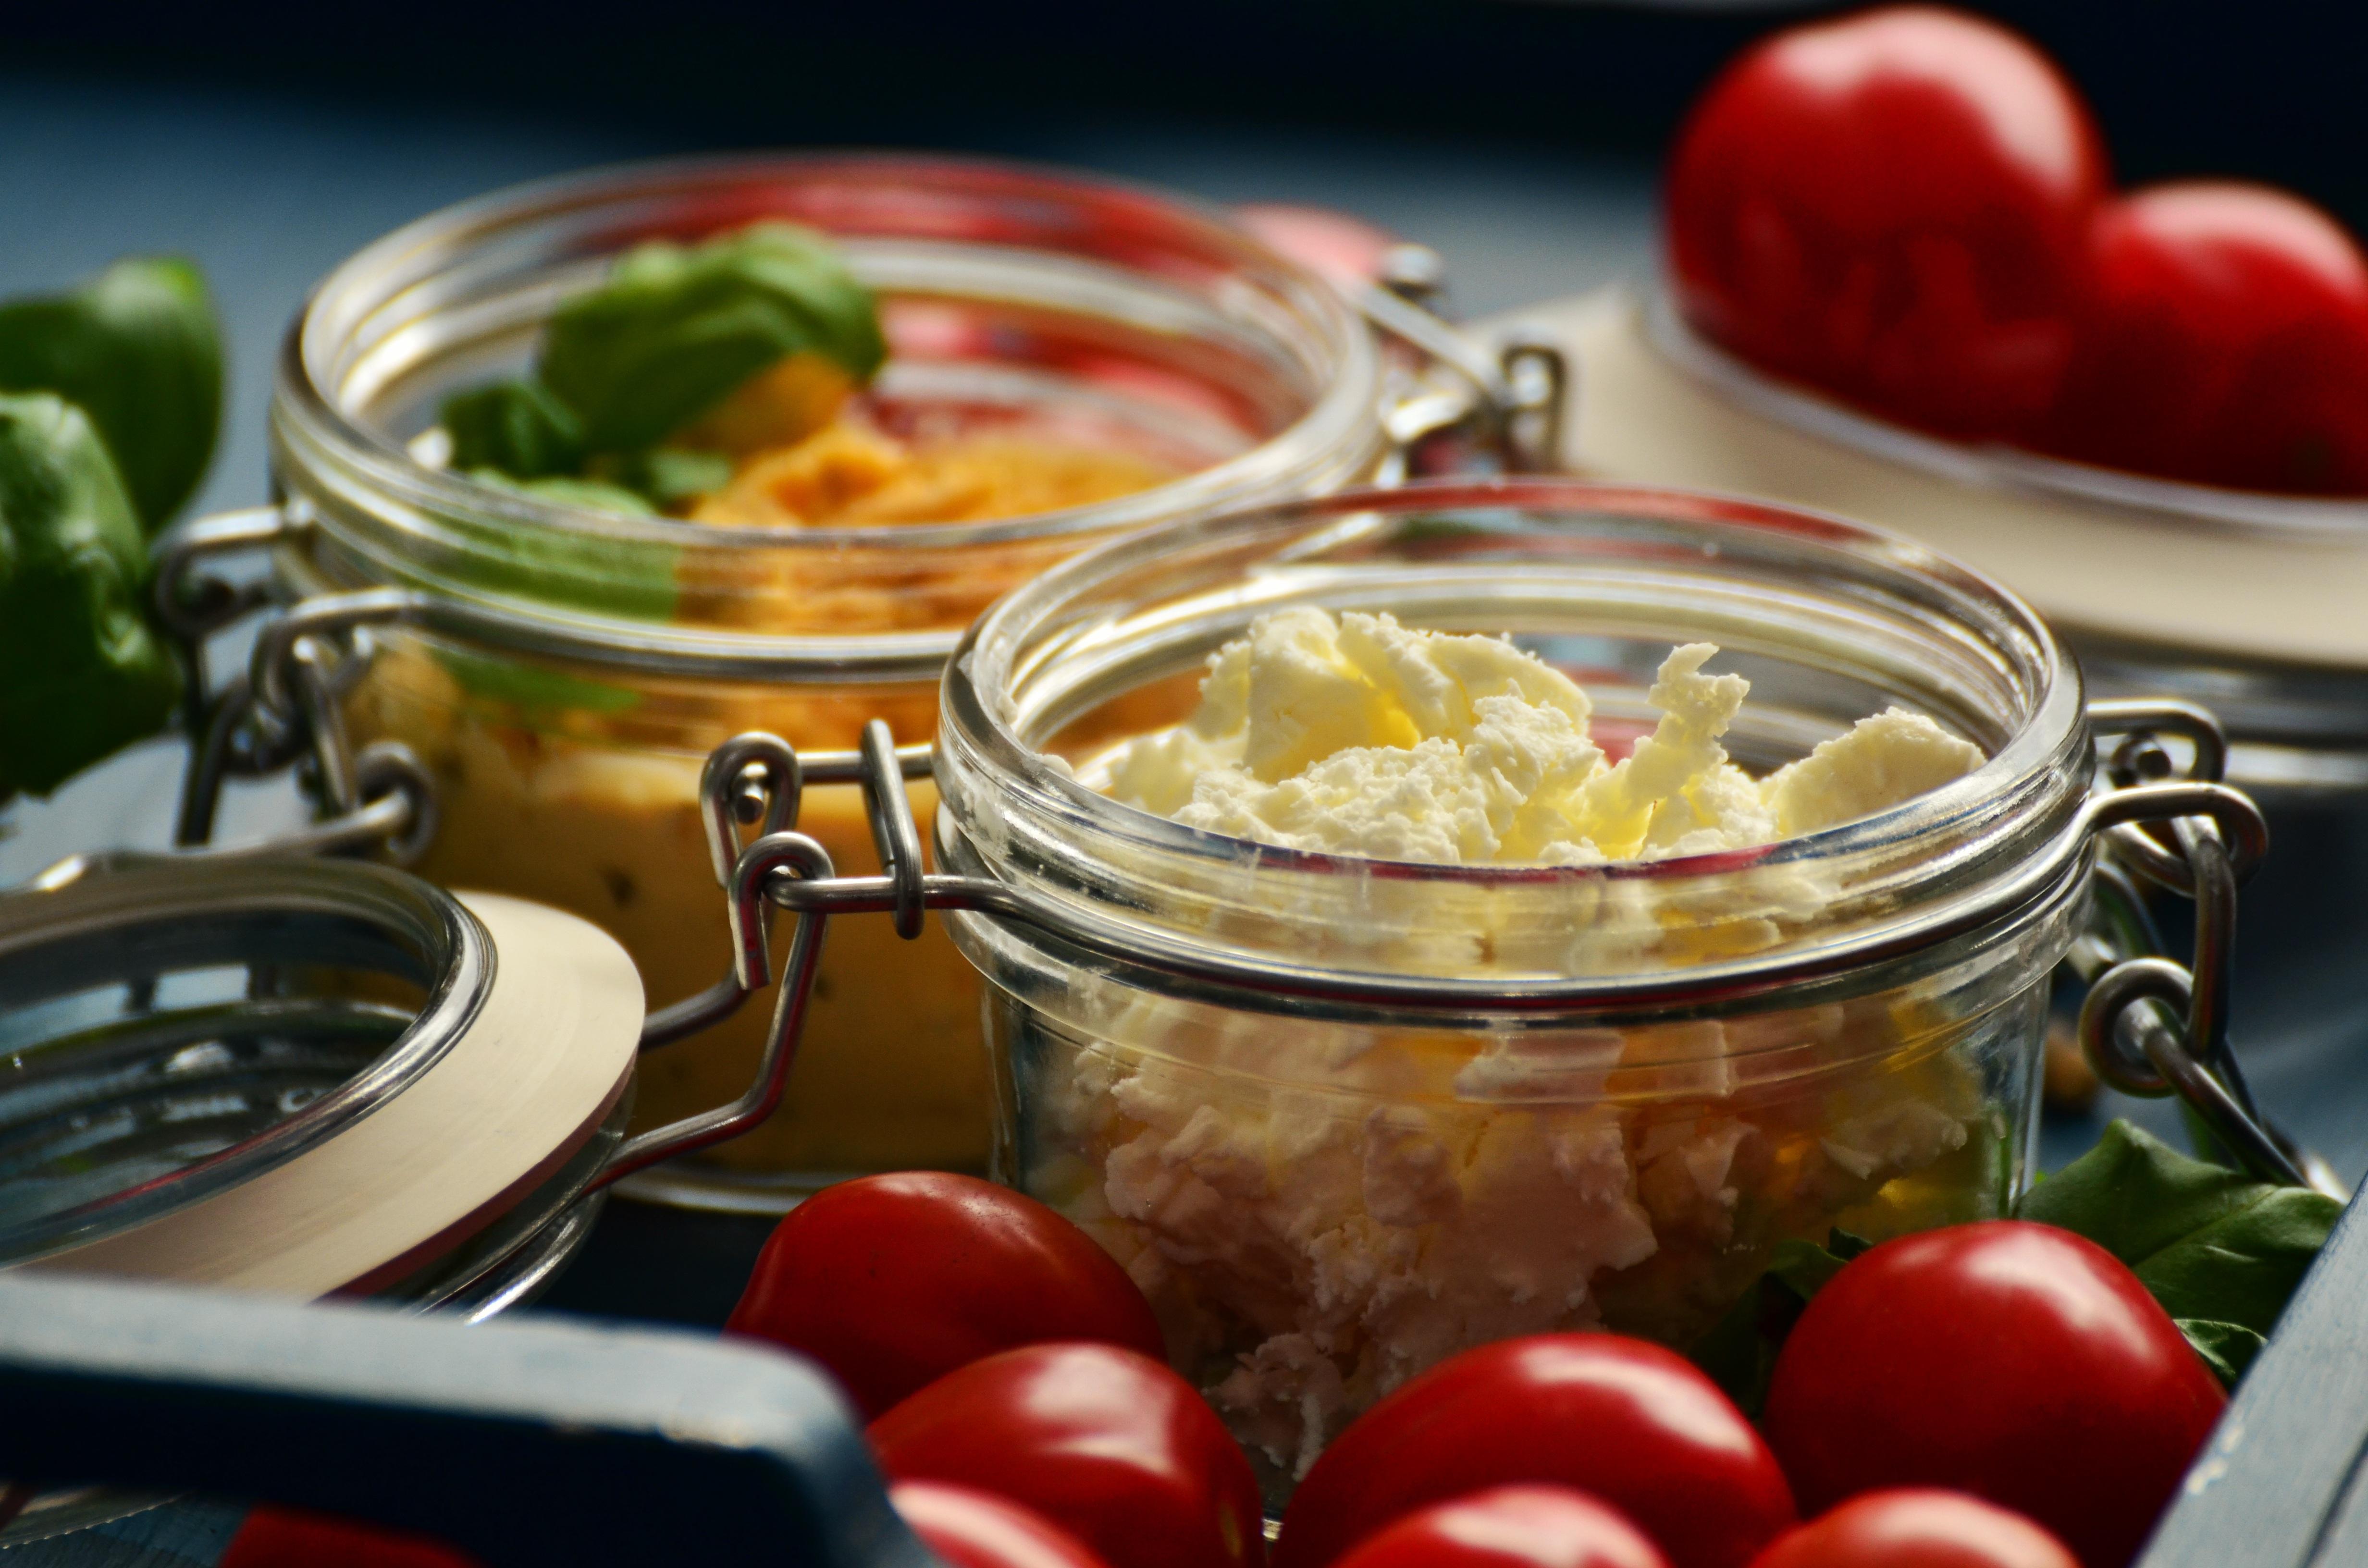 Free images jar dish meal salad mediterranean vegetable free images jar dish meal salad mediterranean vegetable kitchen recipe healthy eat basil condiment tomatoes vegetarian food starter frisch forumfinder Gallery